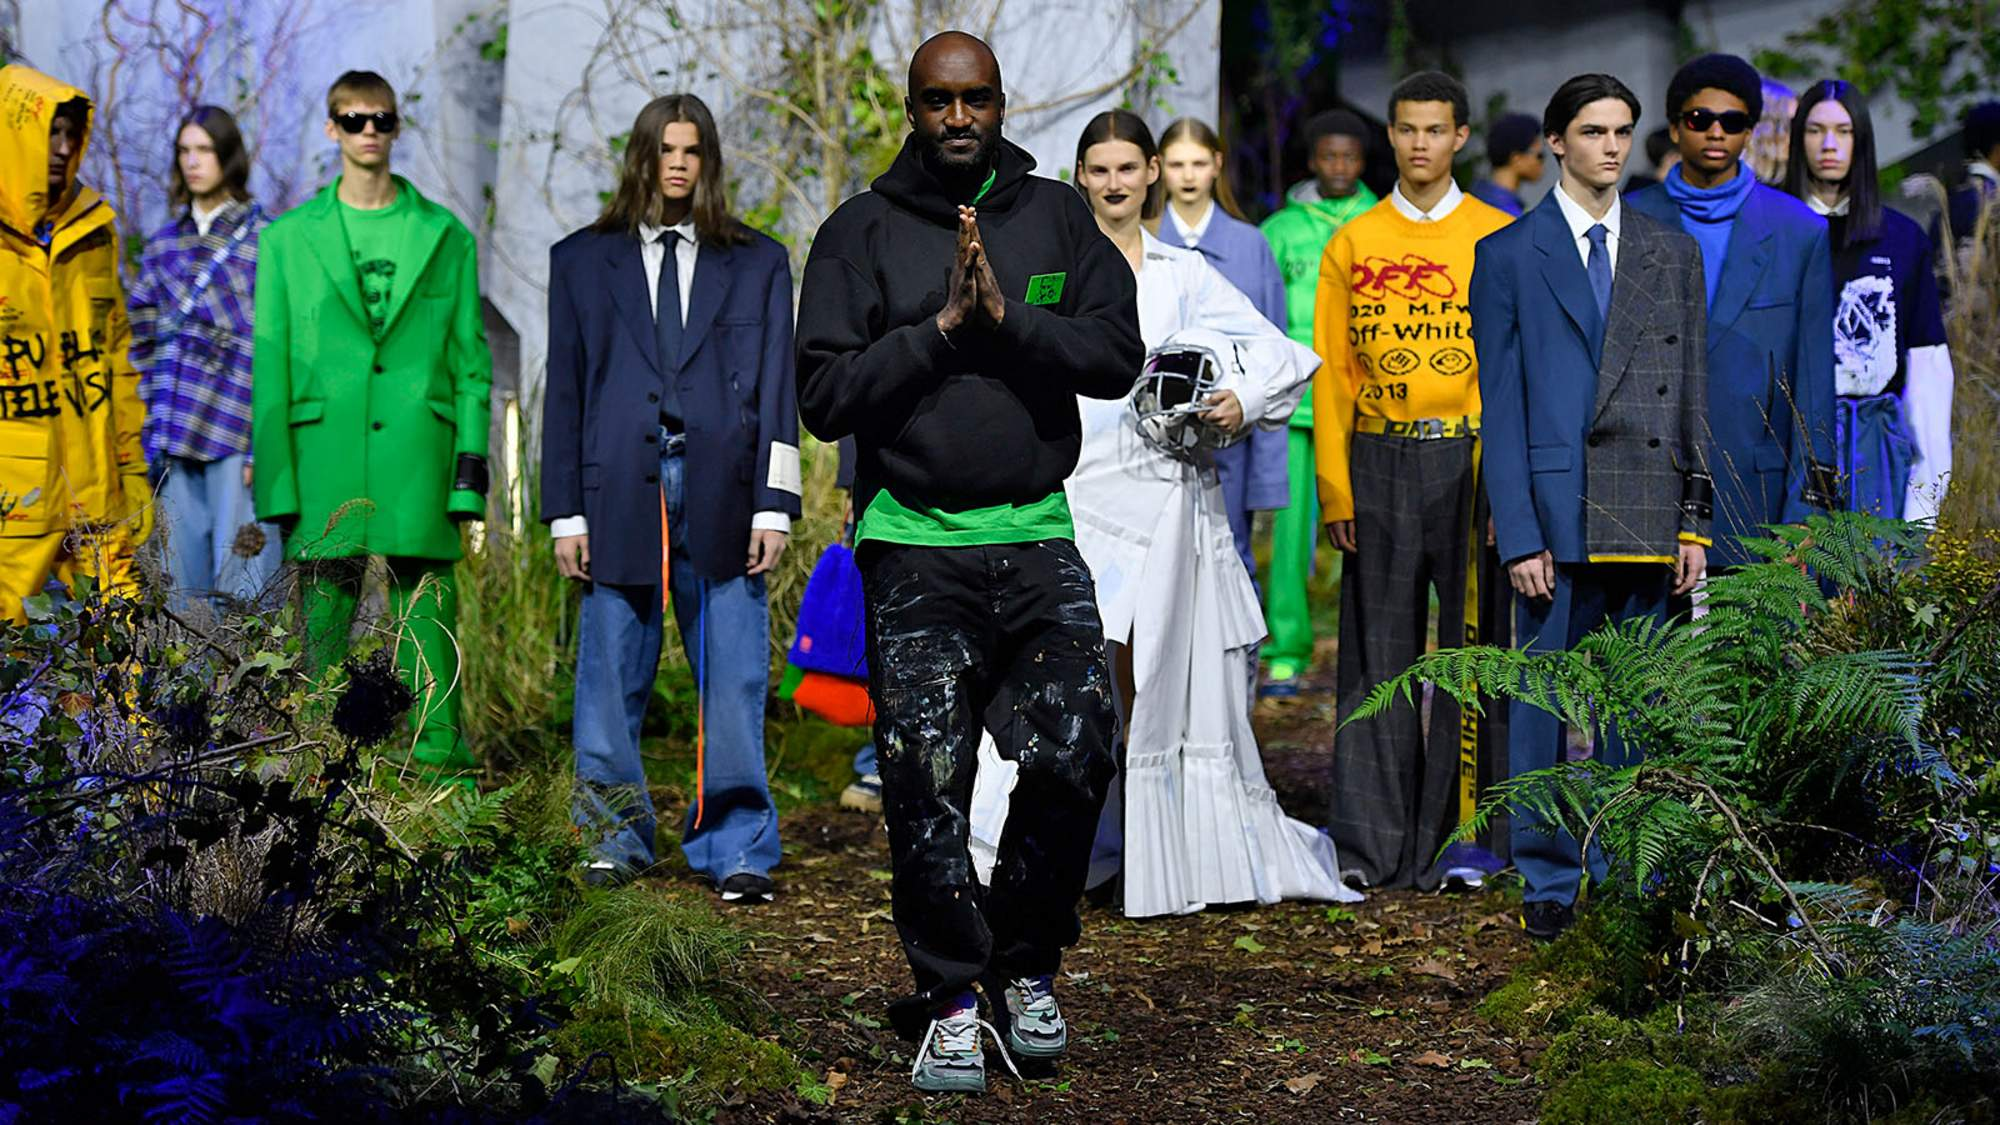 virgil abloh 2019 - Fashion Agenda 2020